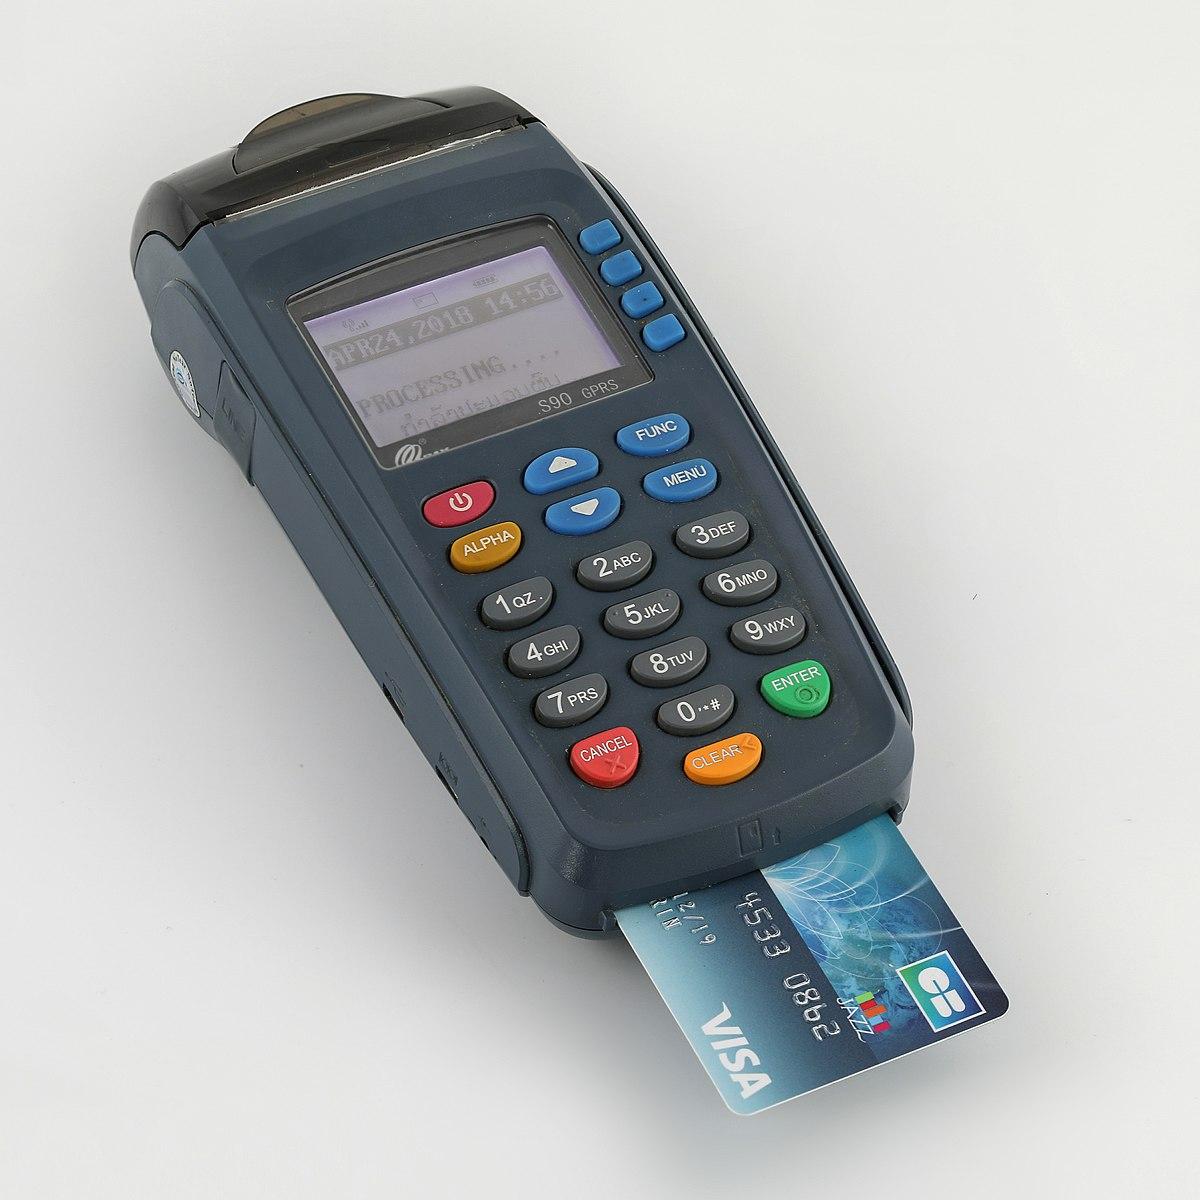 Image Result For Credit Card Data